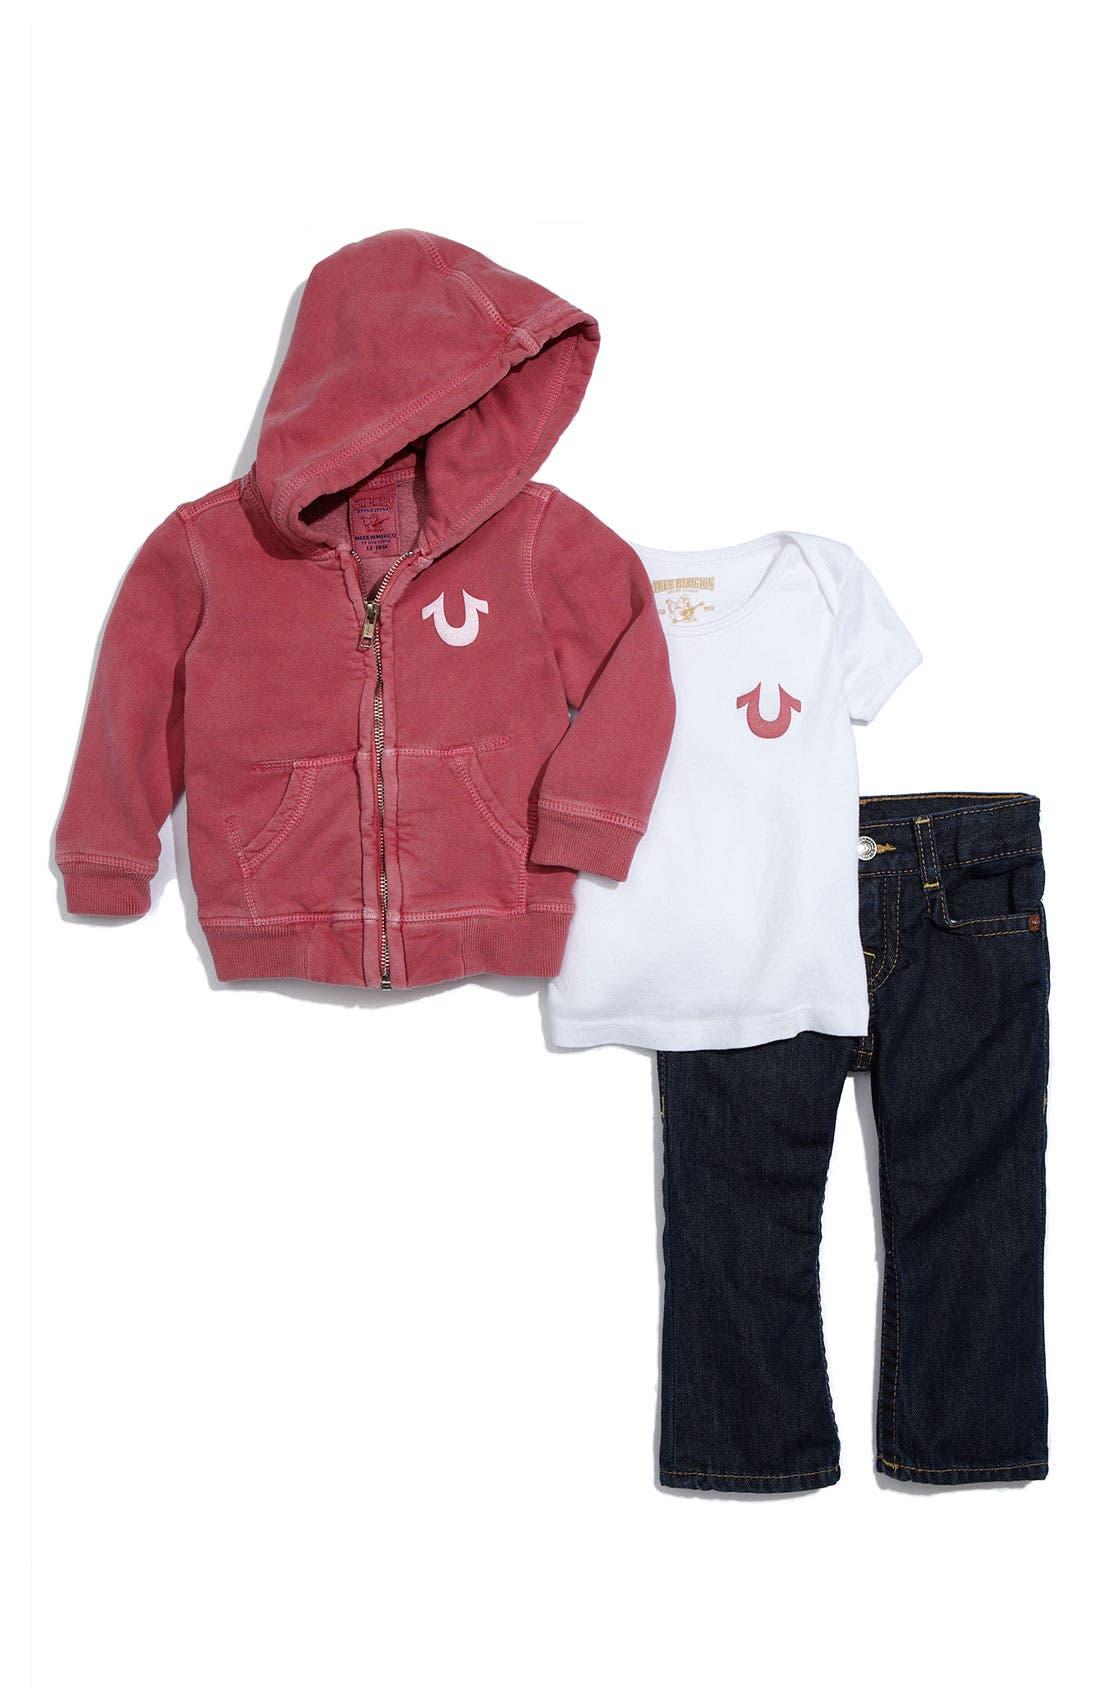 Alternate Image 1 Selected - True Religion Brand Jeans 3-Piece Gift Set (Infant)